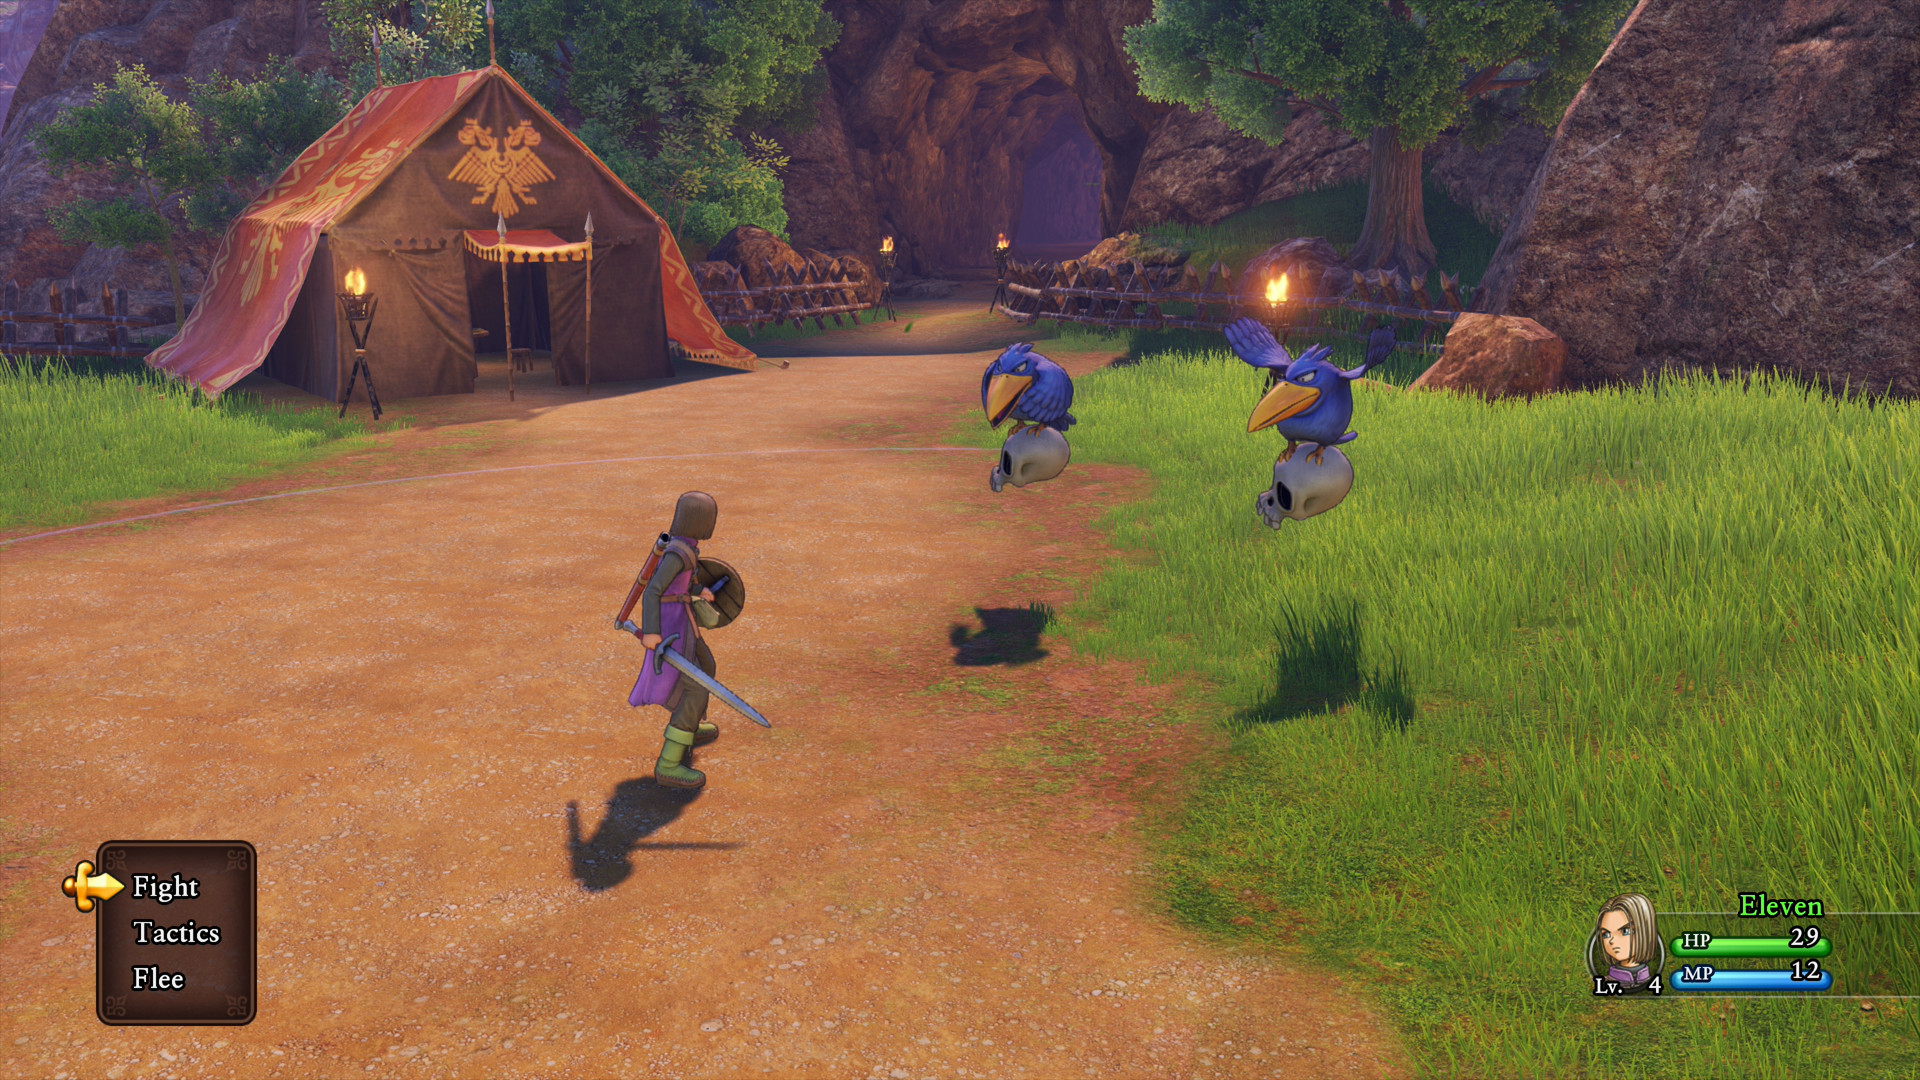 Dragon Quest XI: Echoes of an Elusive Age Screenshot 2